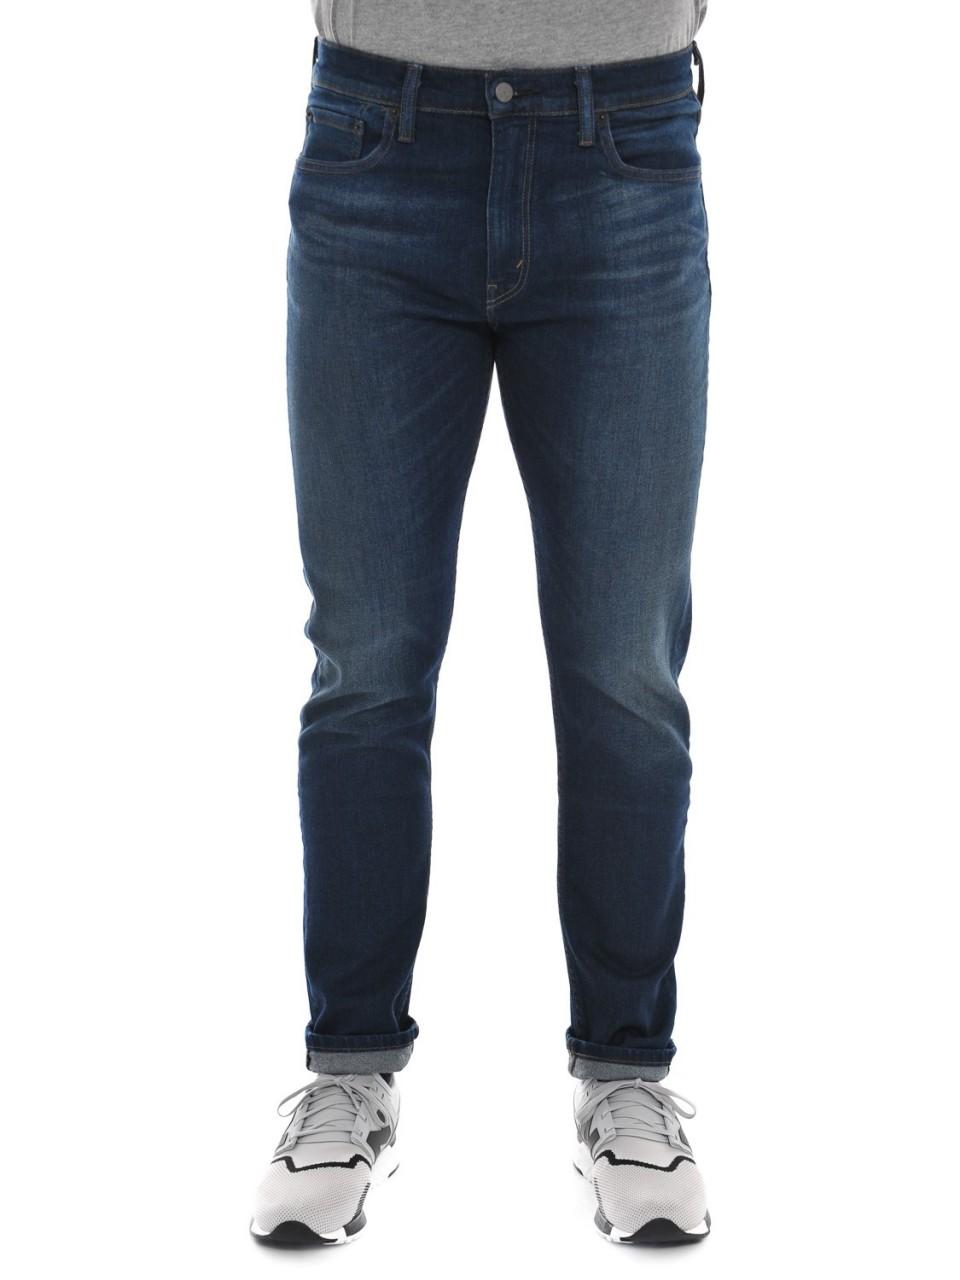 Levi's Uomo Jeans Levi's 512 Uomo Ludlow L 34 8330061G